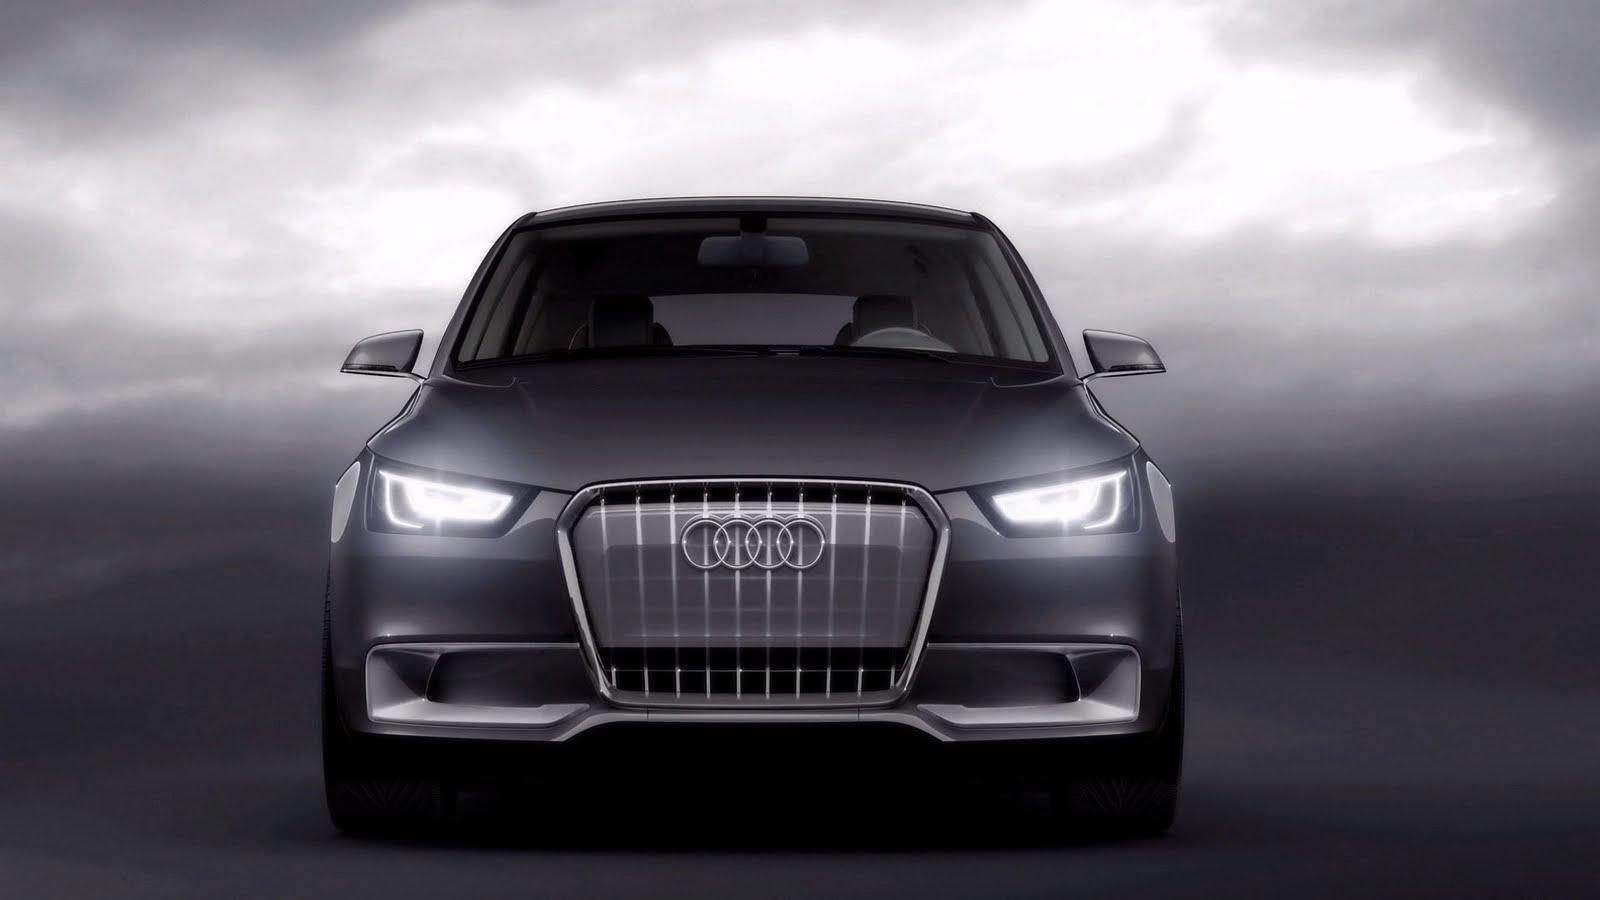 Image Hub: Audi Cars HD Wallpapers